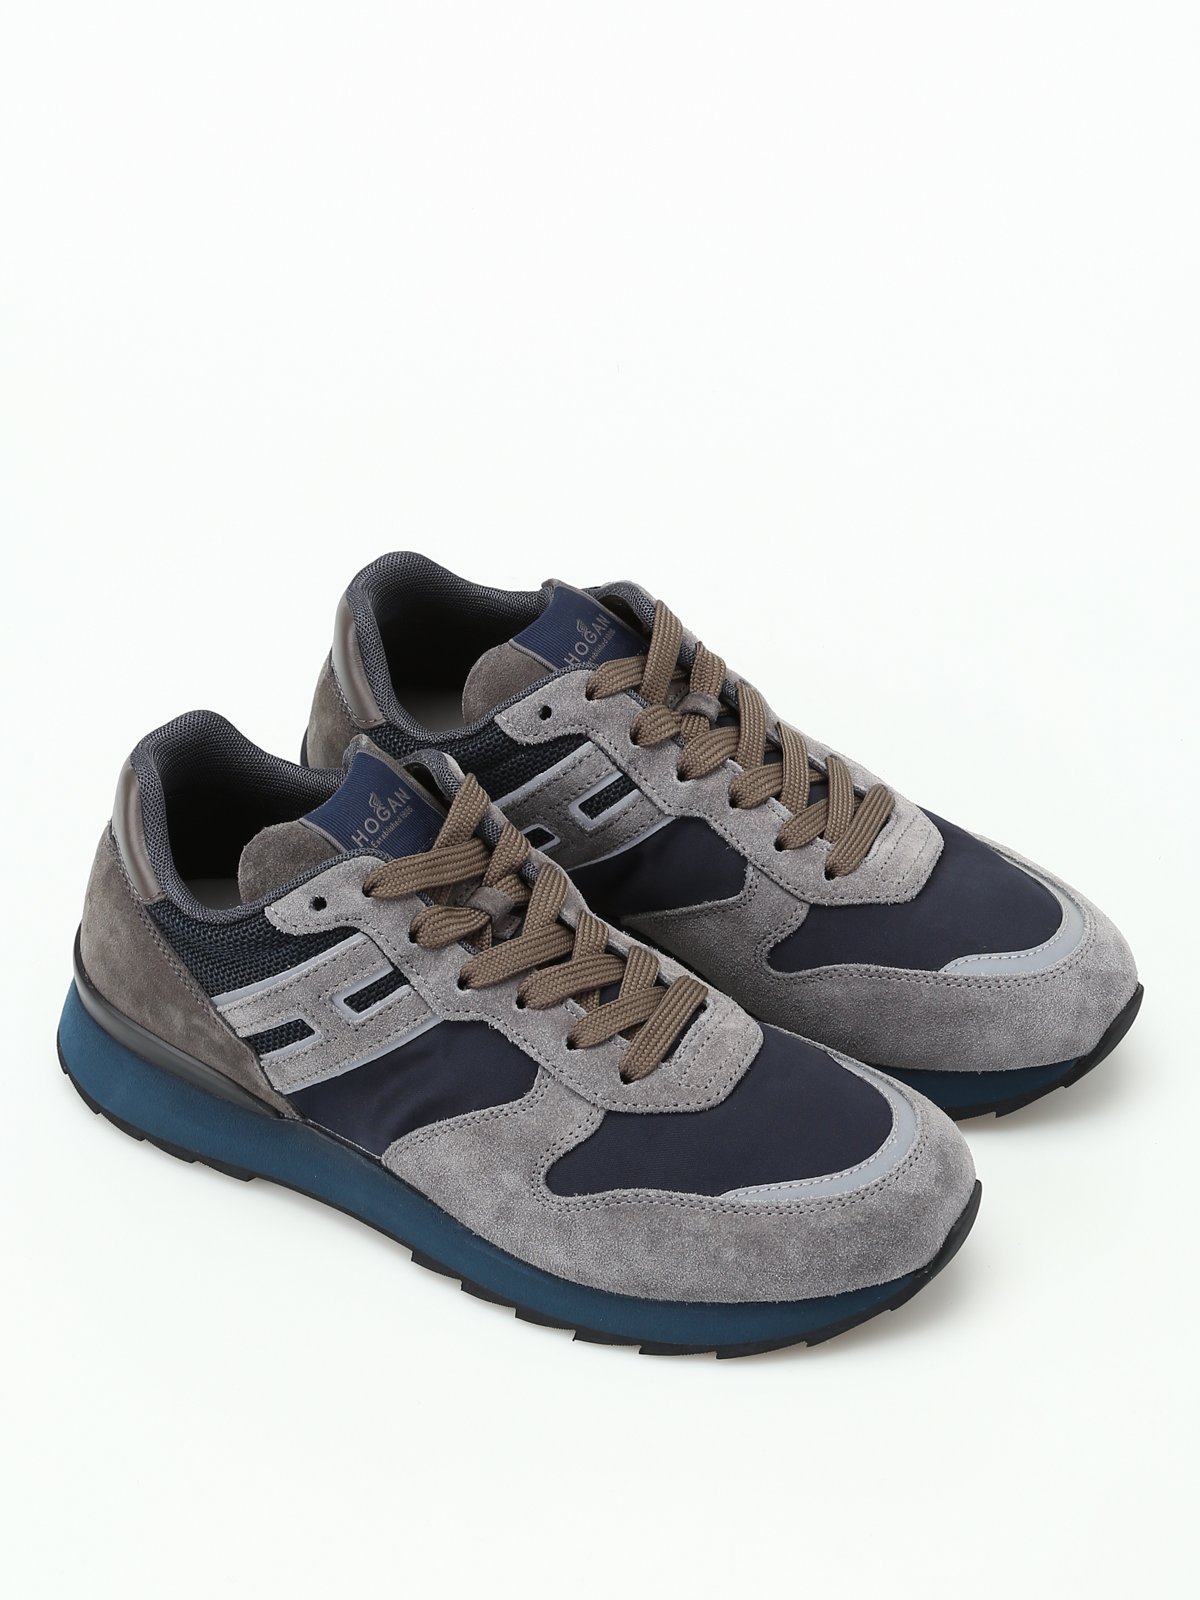 R261 Running sneakers - Grey Hogan XV0om0Nh